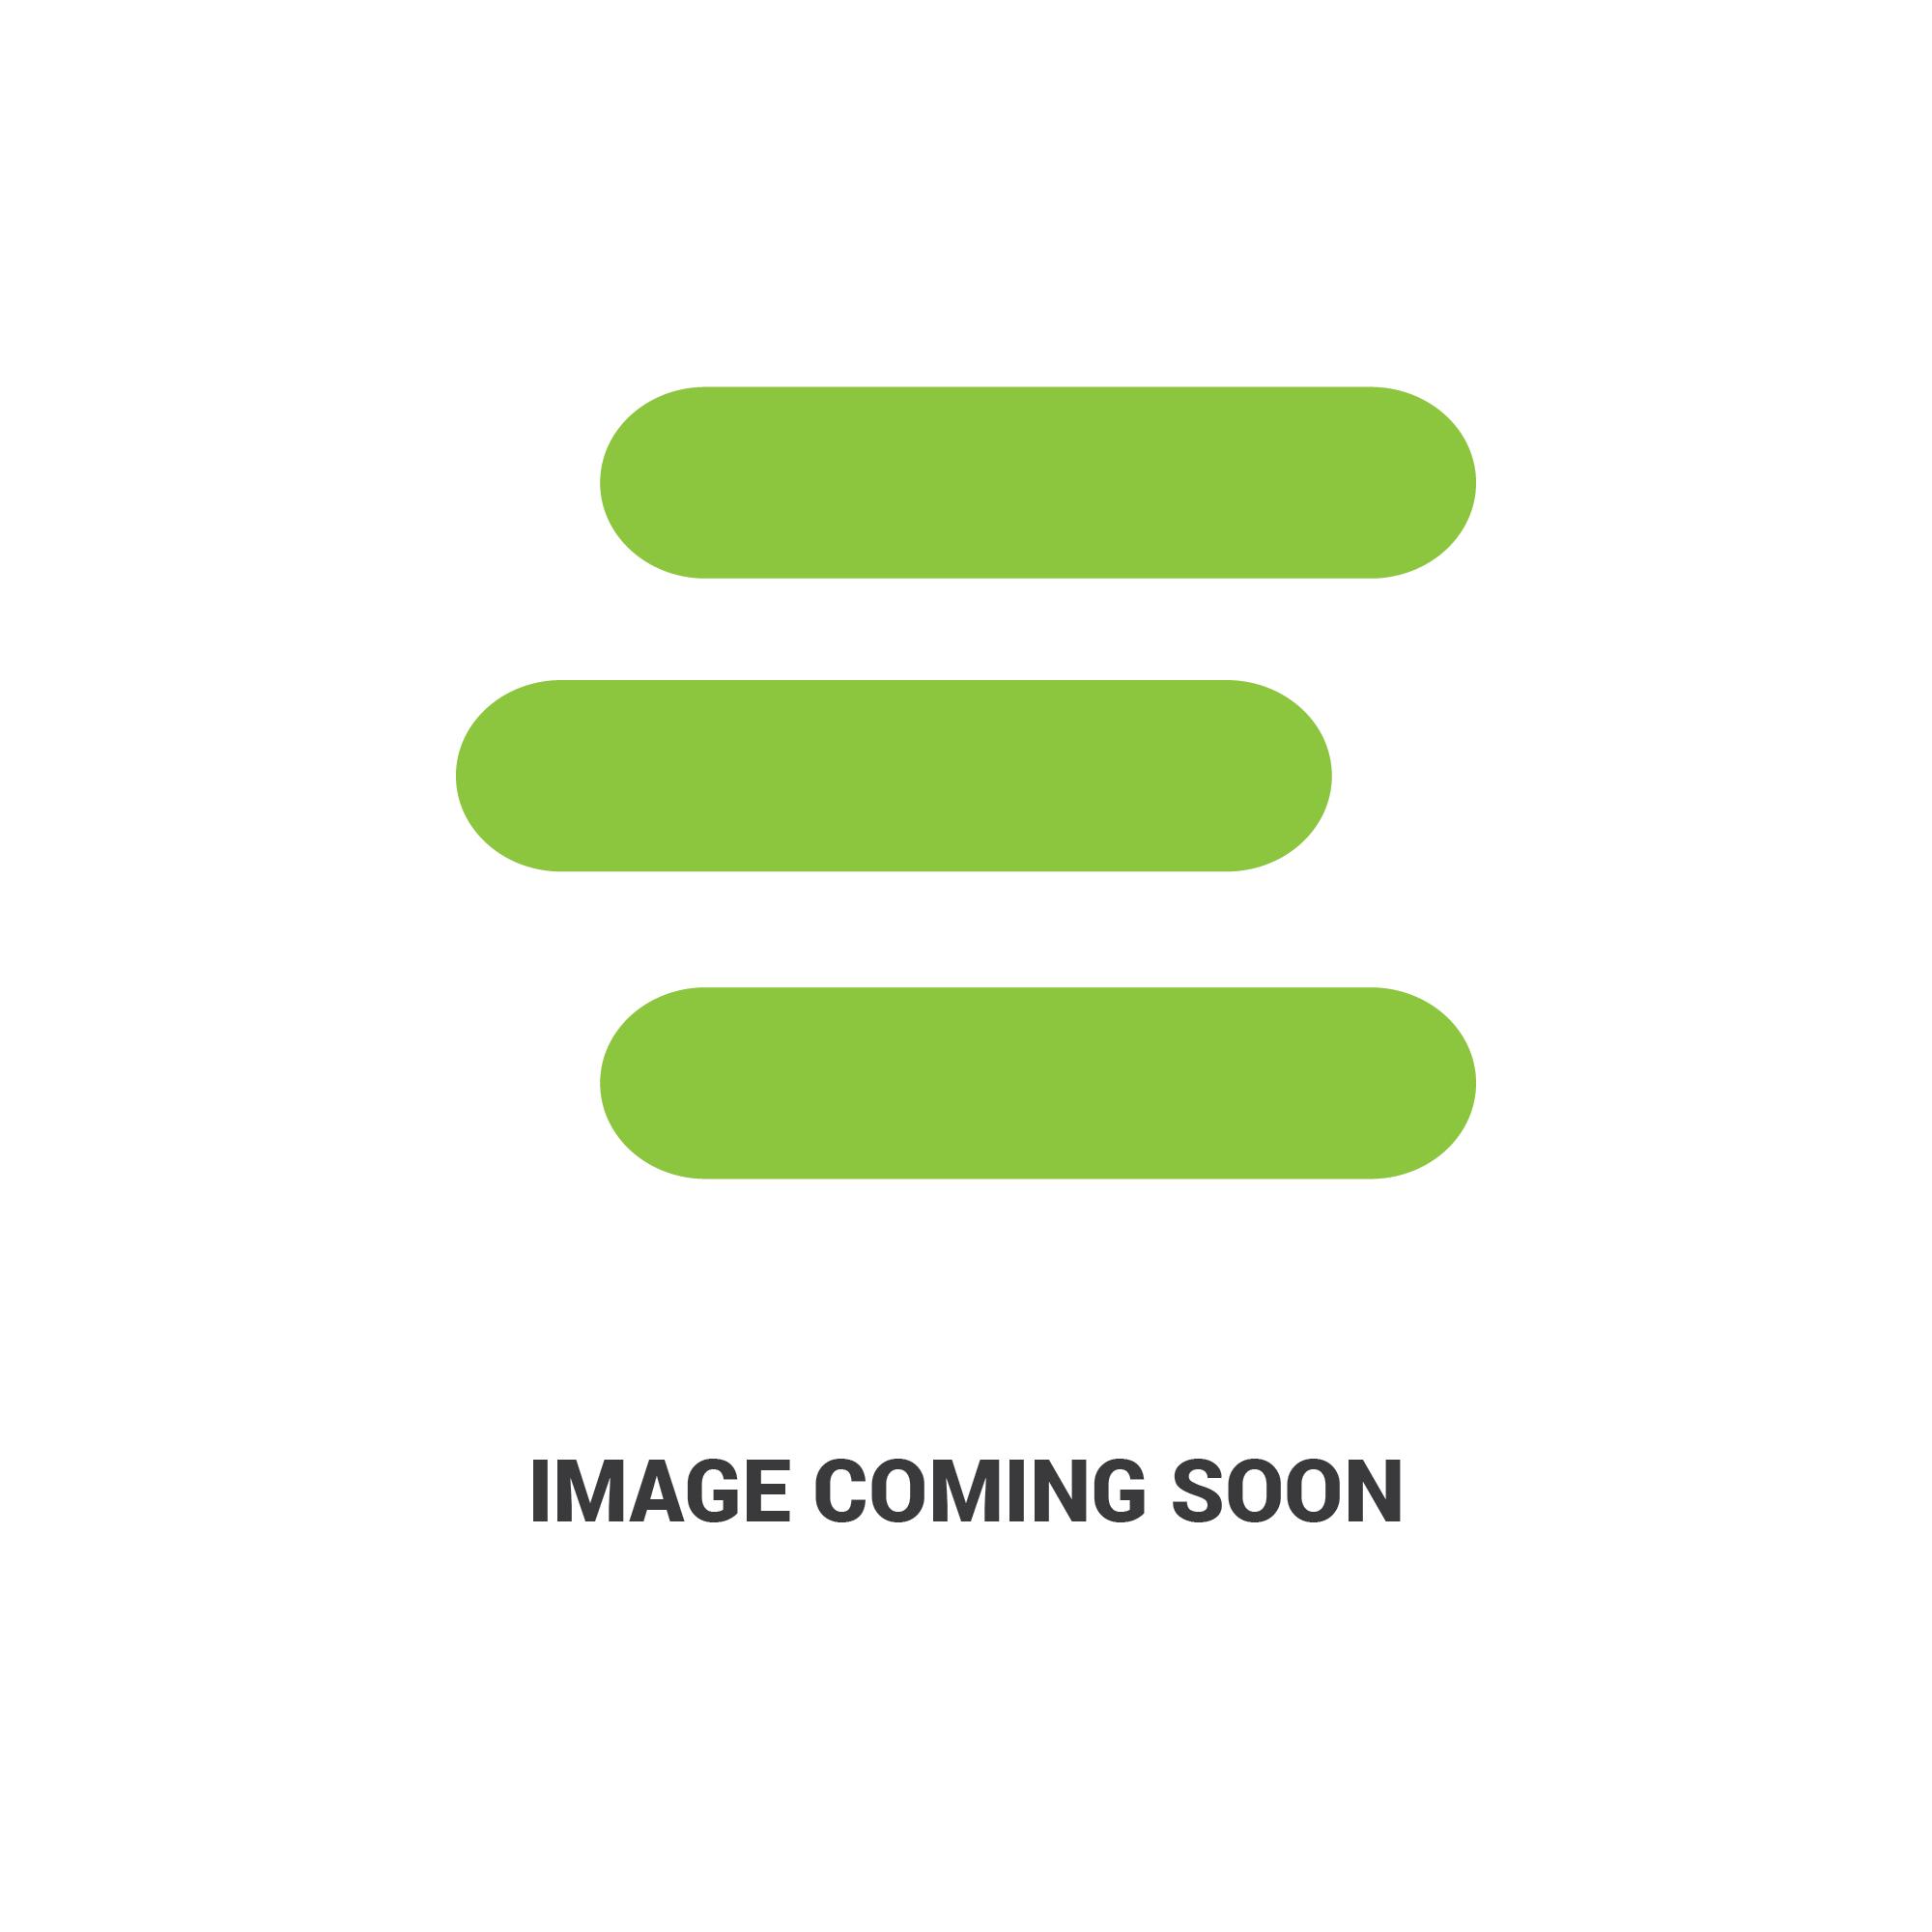 E-1132681466_1.jpg